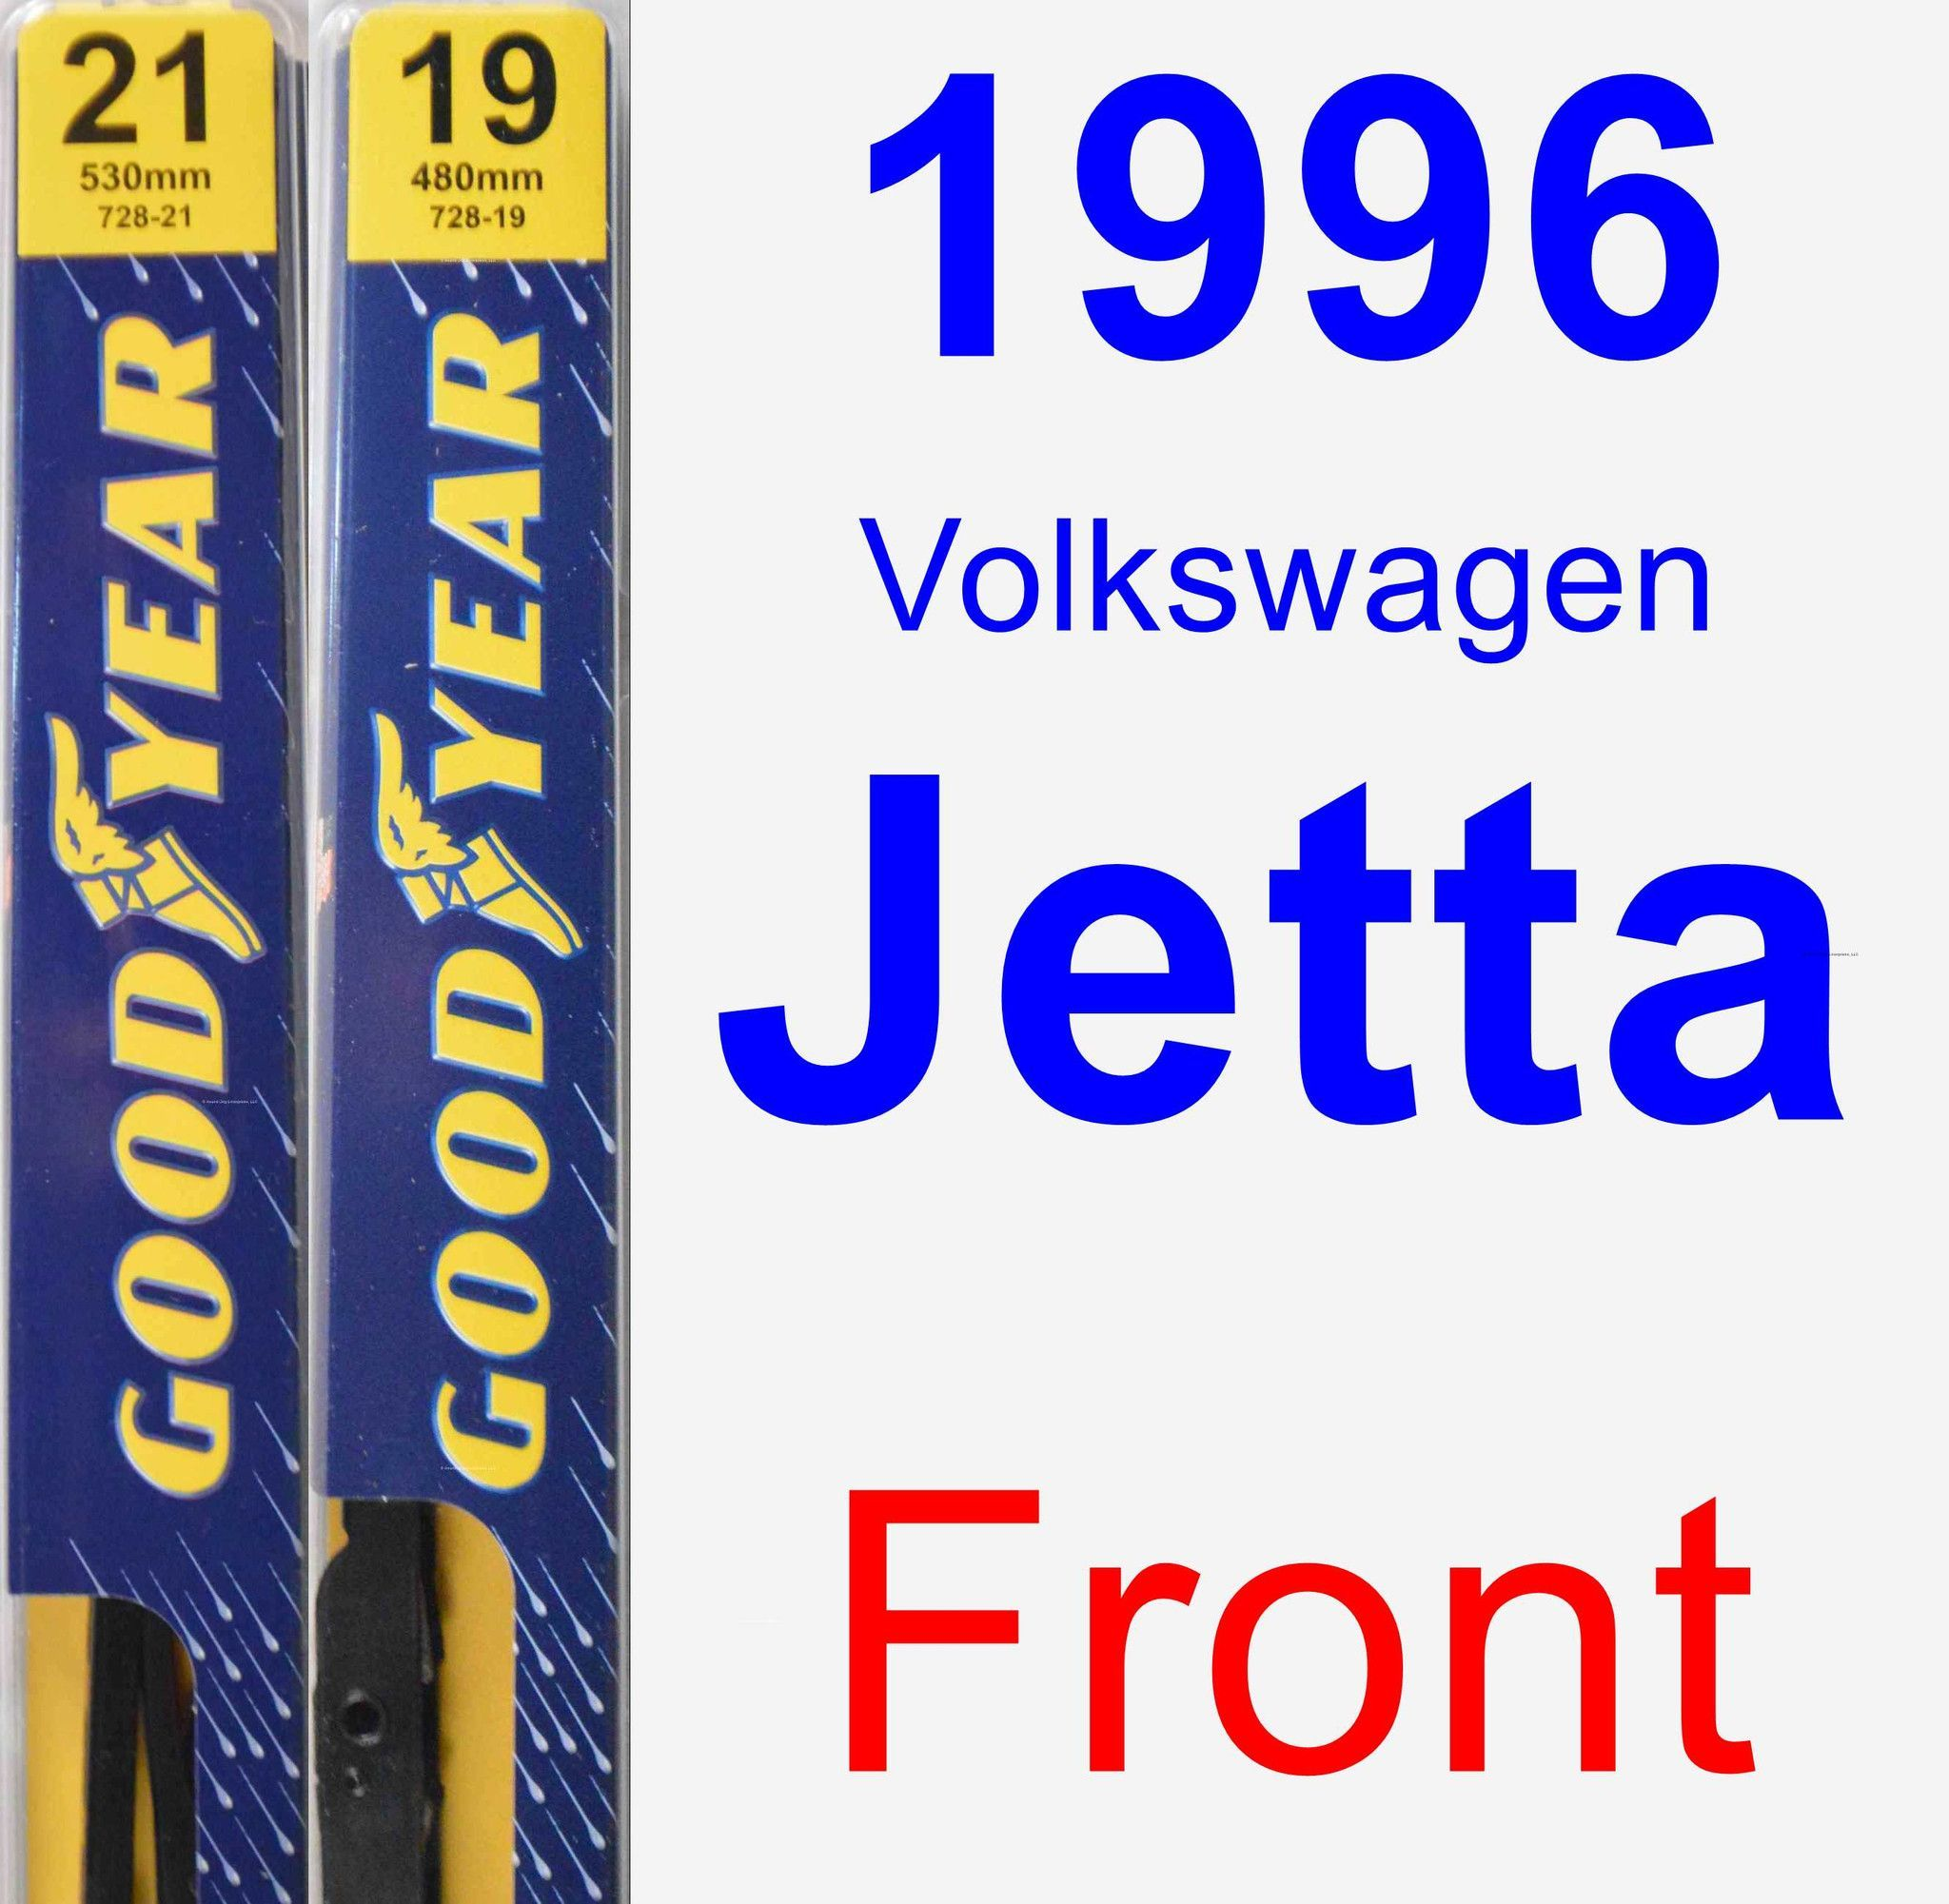 Front Wiper Blade Pack for 1996 Volkswagen Jetta - Premium